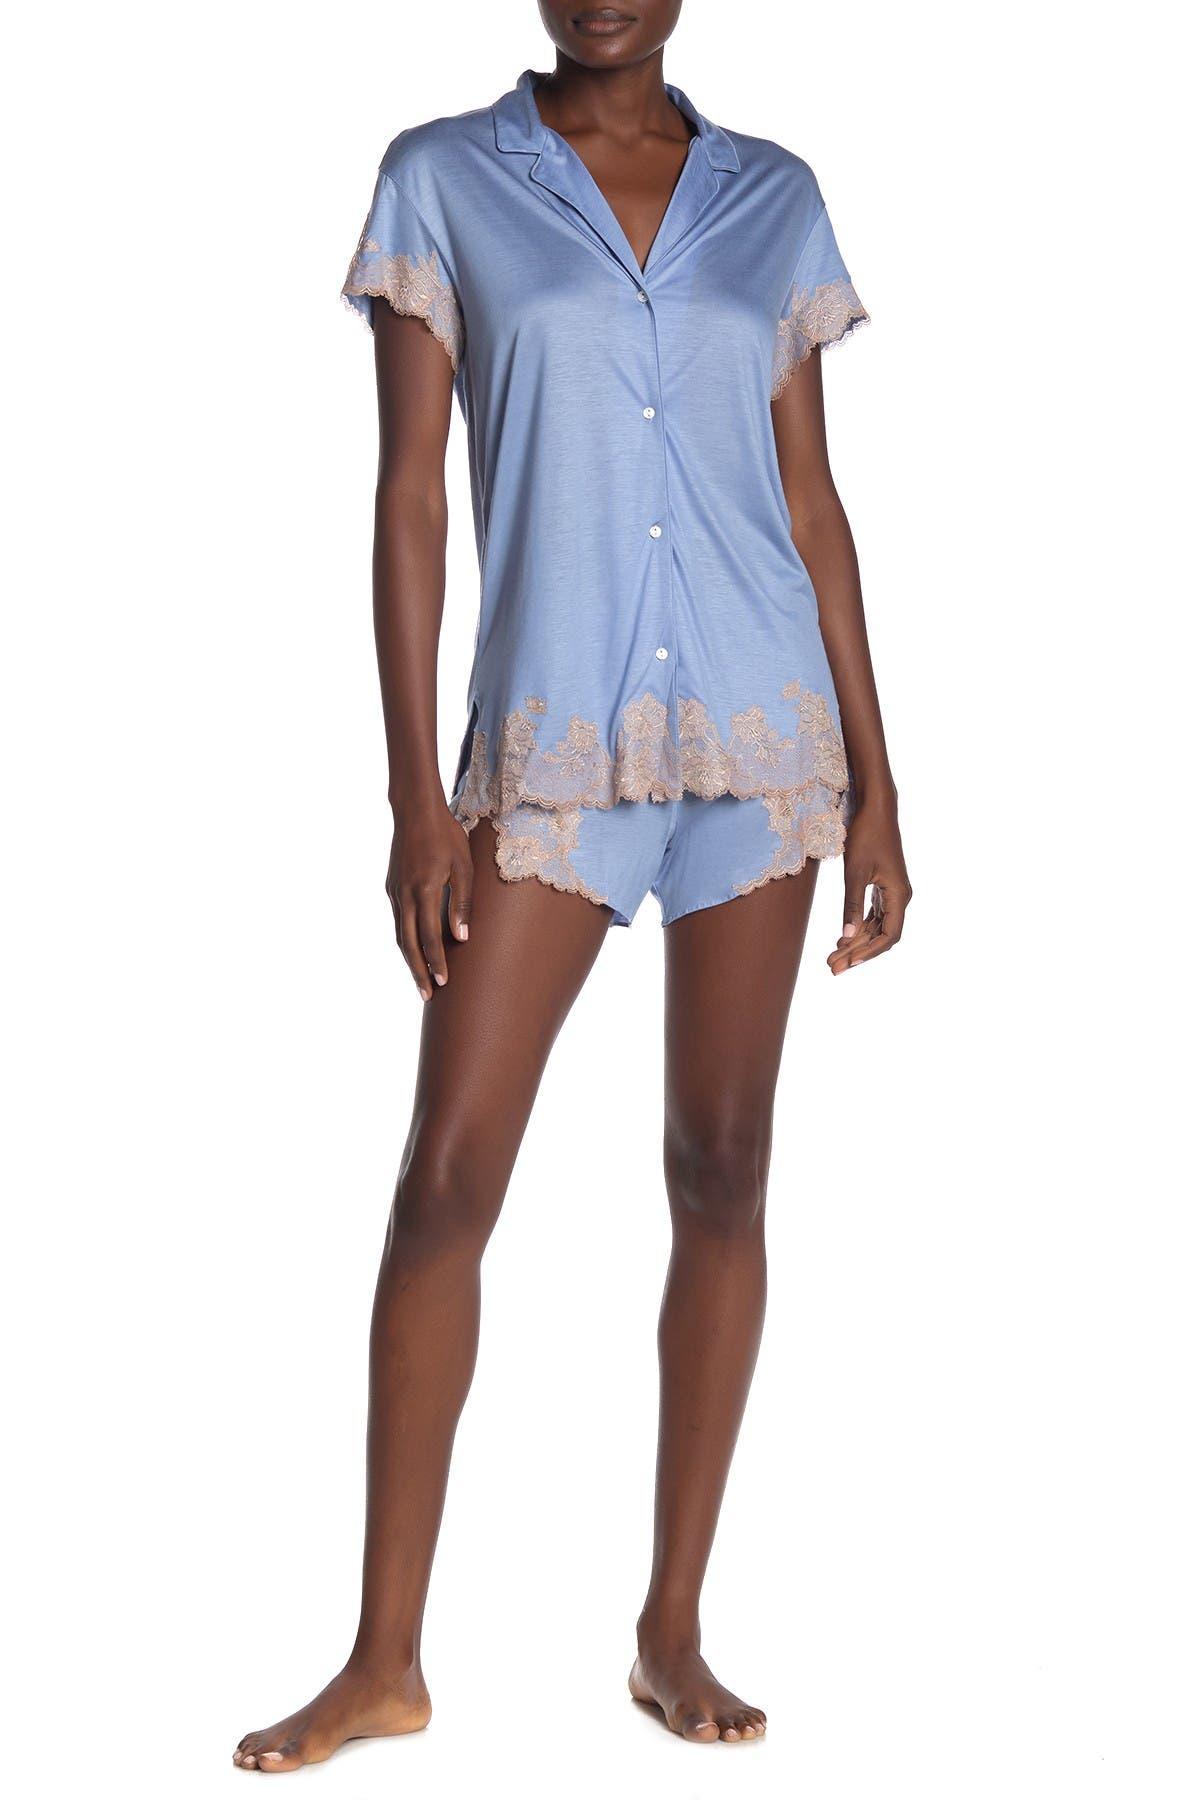 Image of Josie Natori Notch Collar Shirt & Shorts Pajama 2-Piece Set